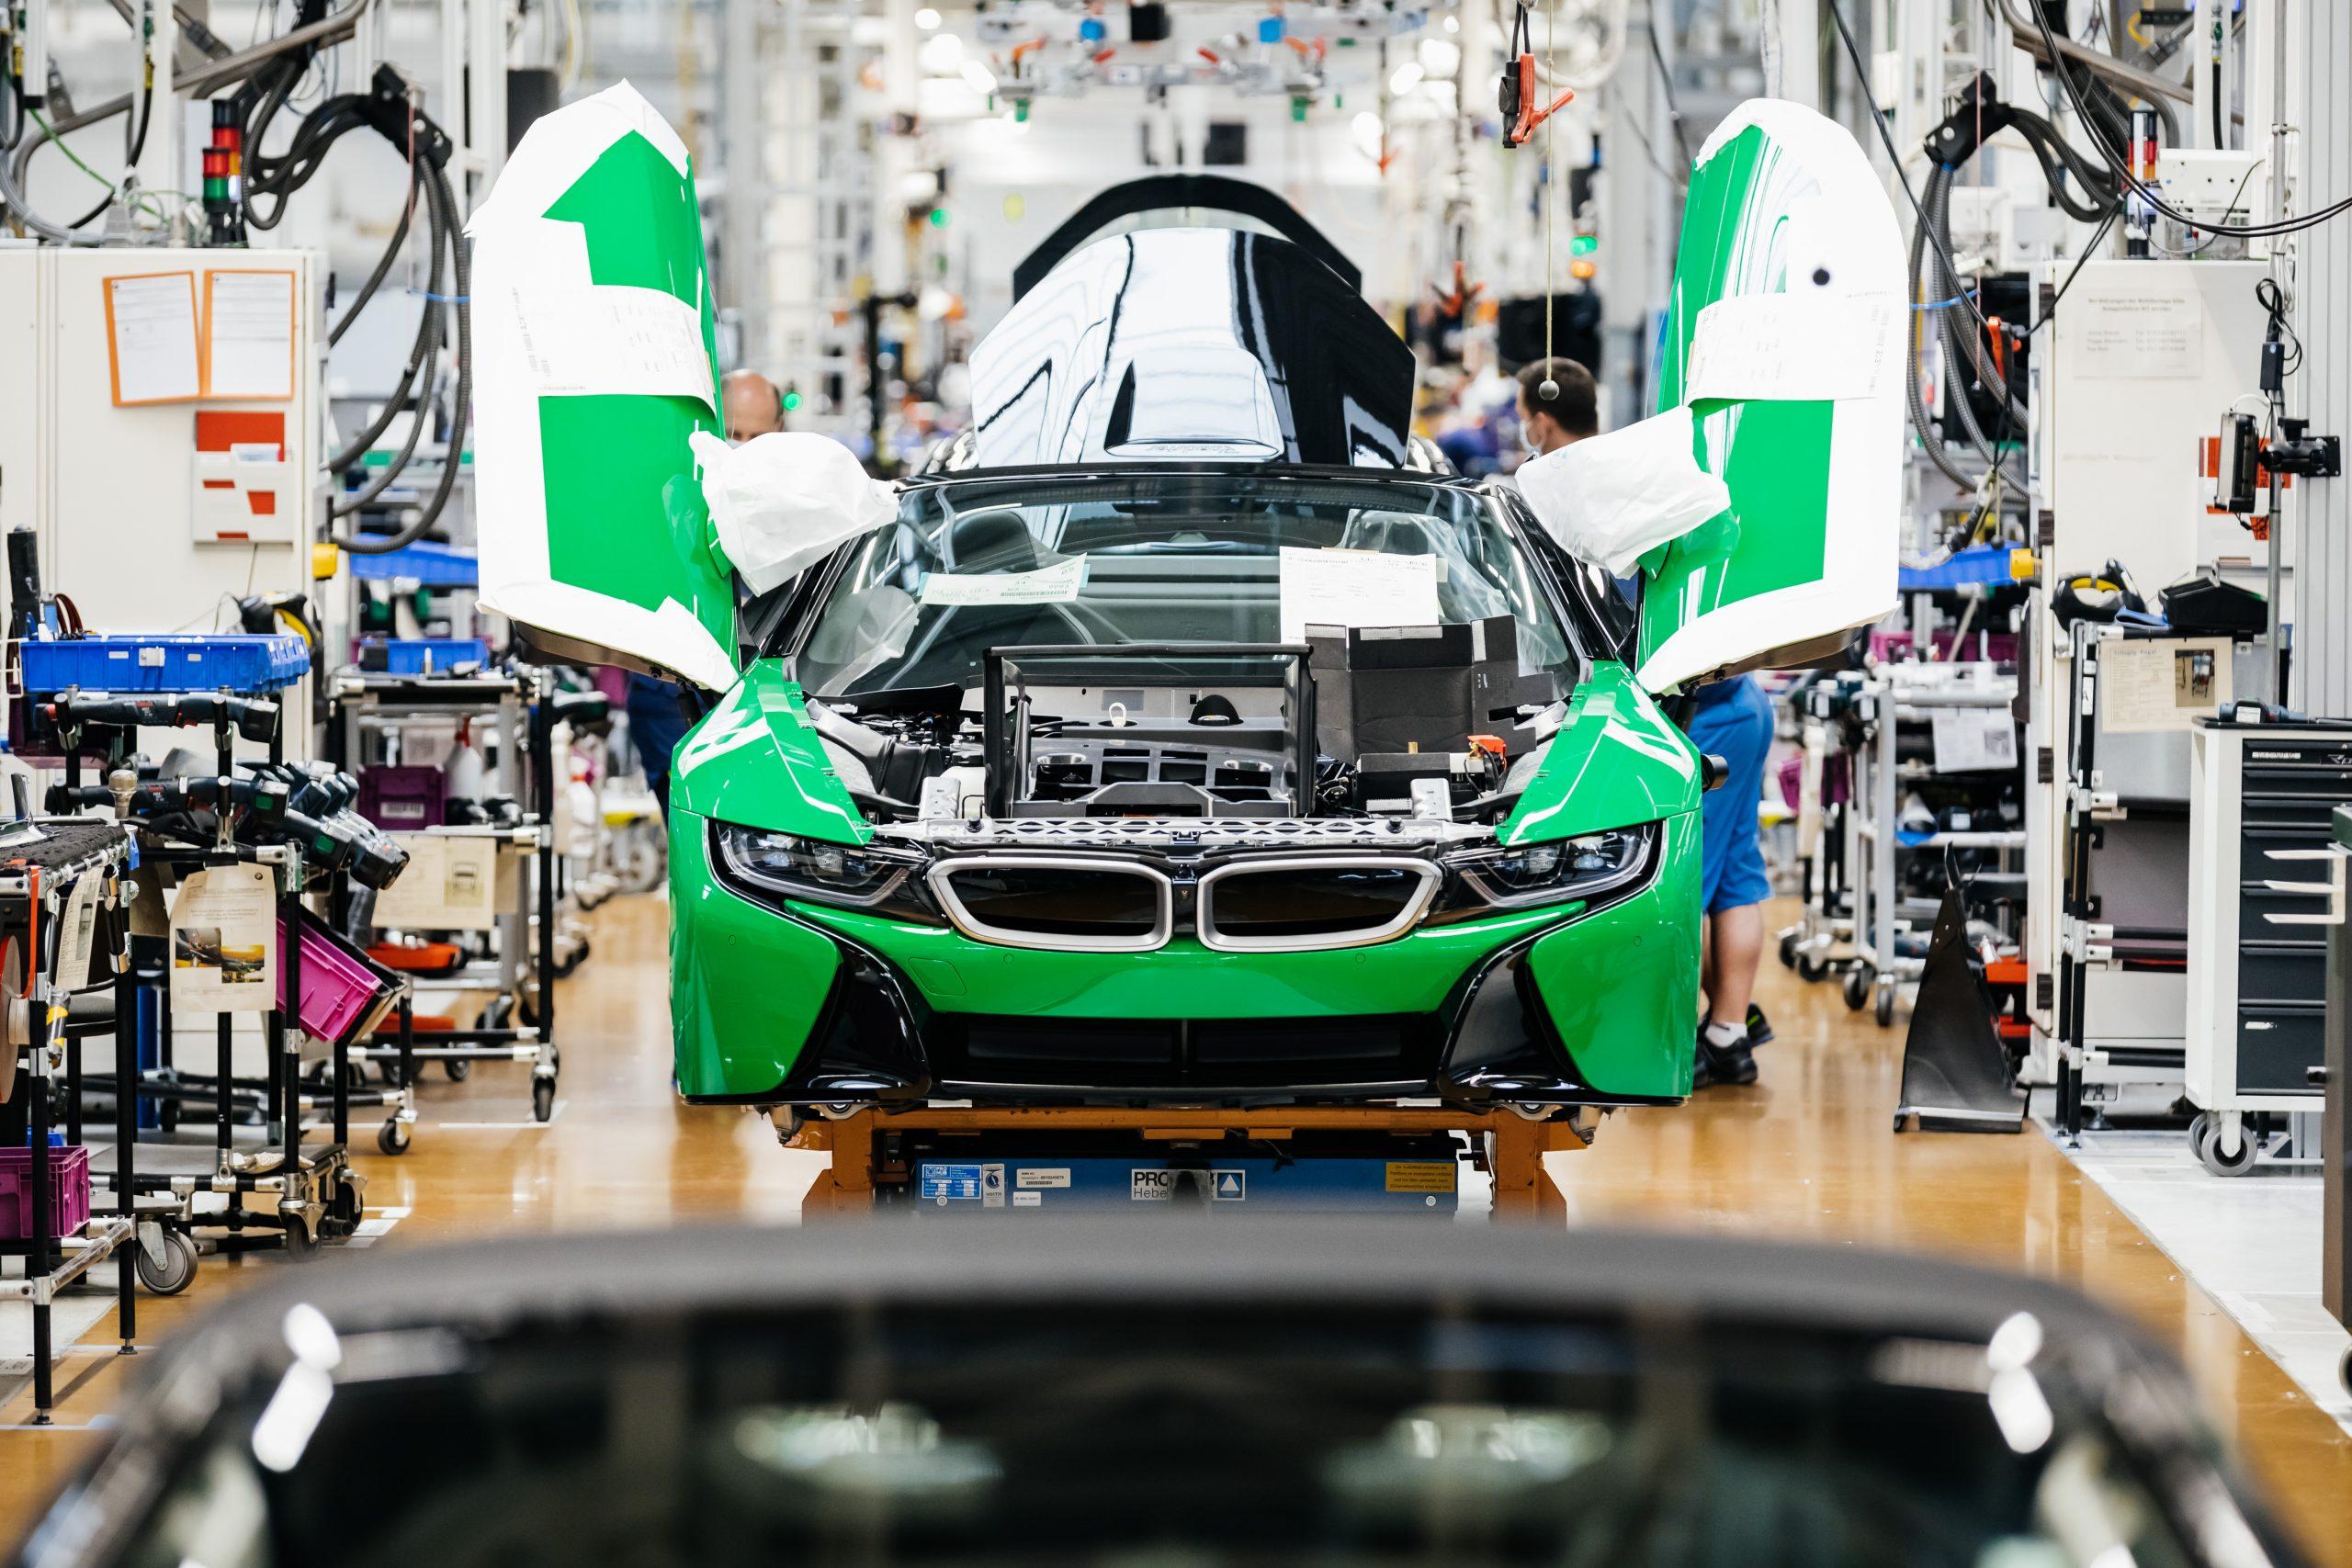 BMW i8 final 18 -factory 8